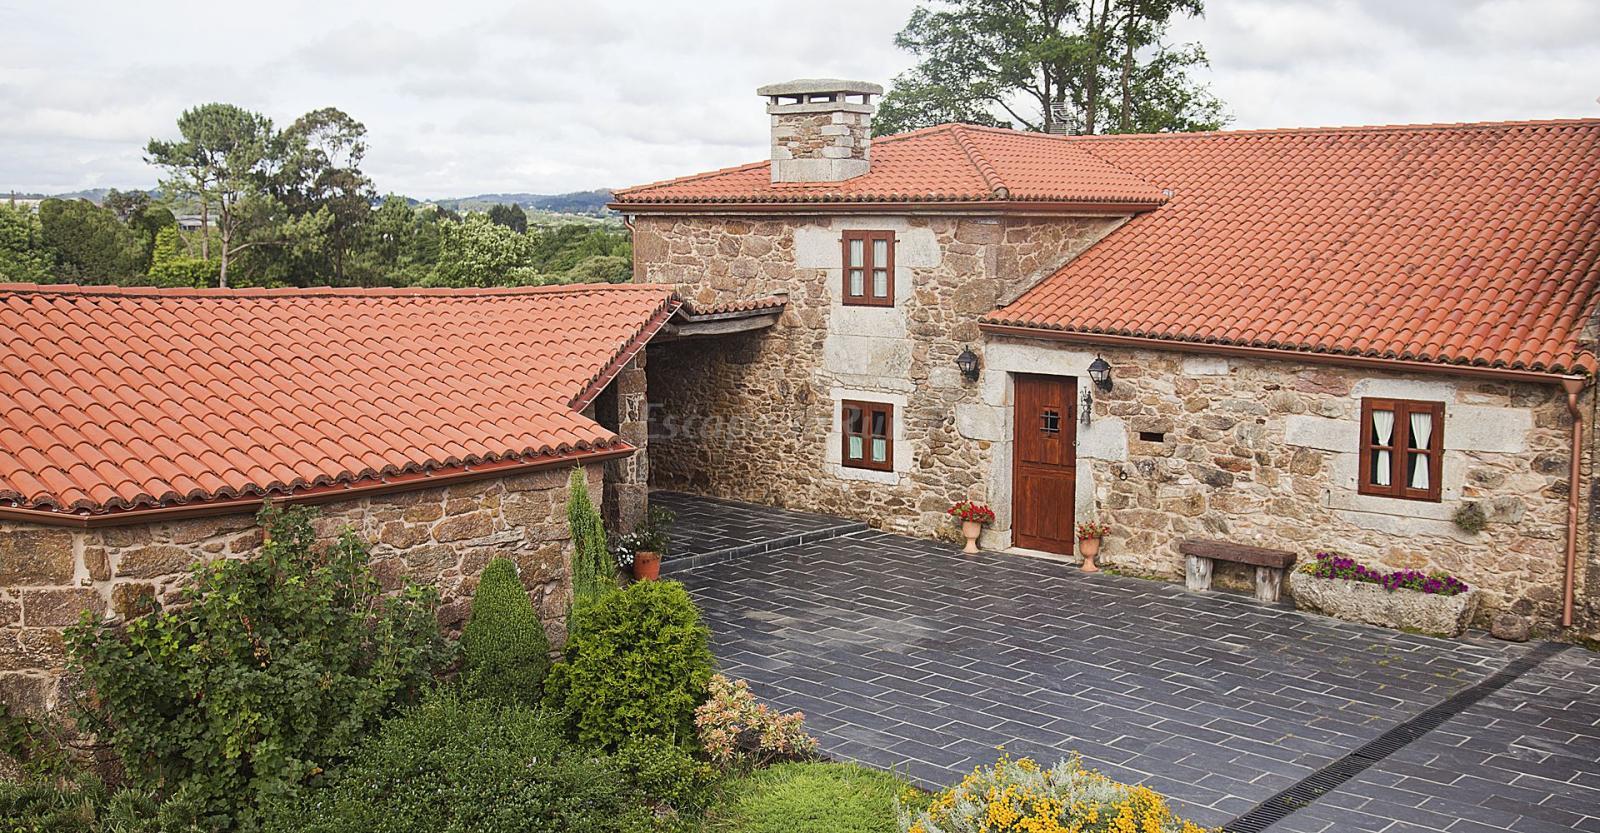 Fotos de casa lugar de trasande casa rural en a laracha - Casas en a coruna ...